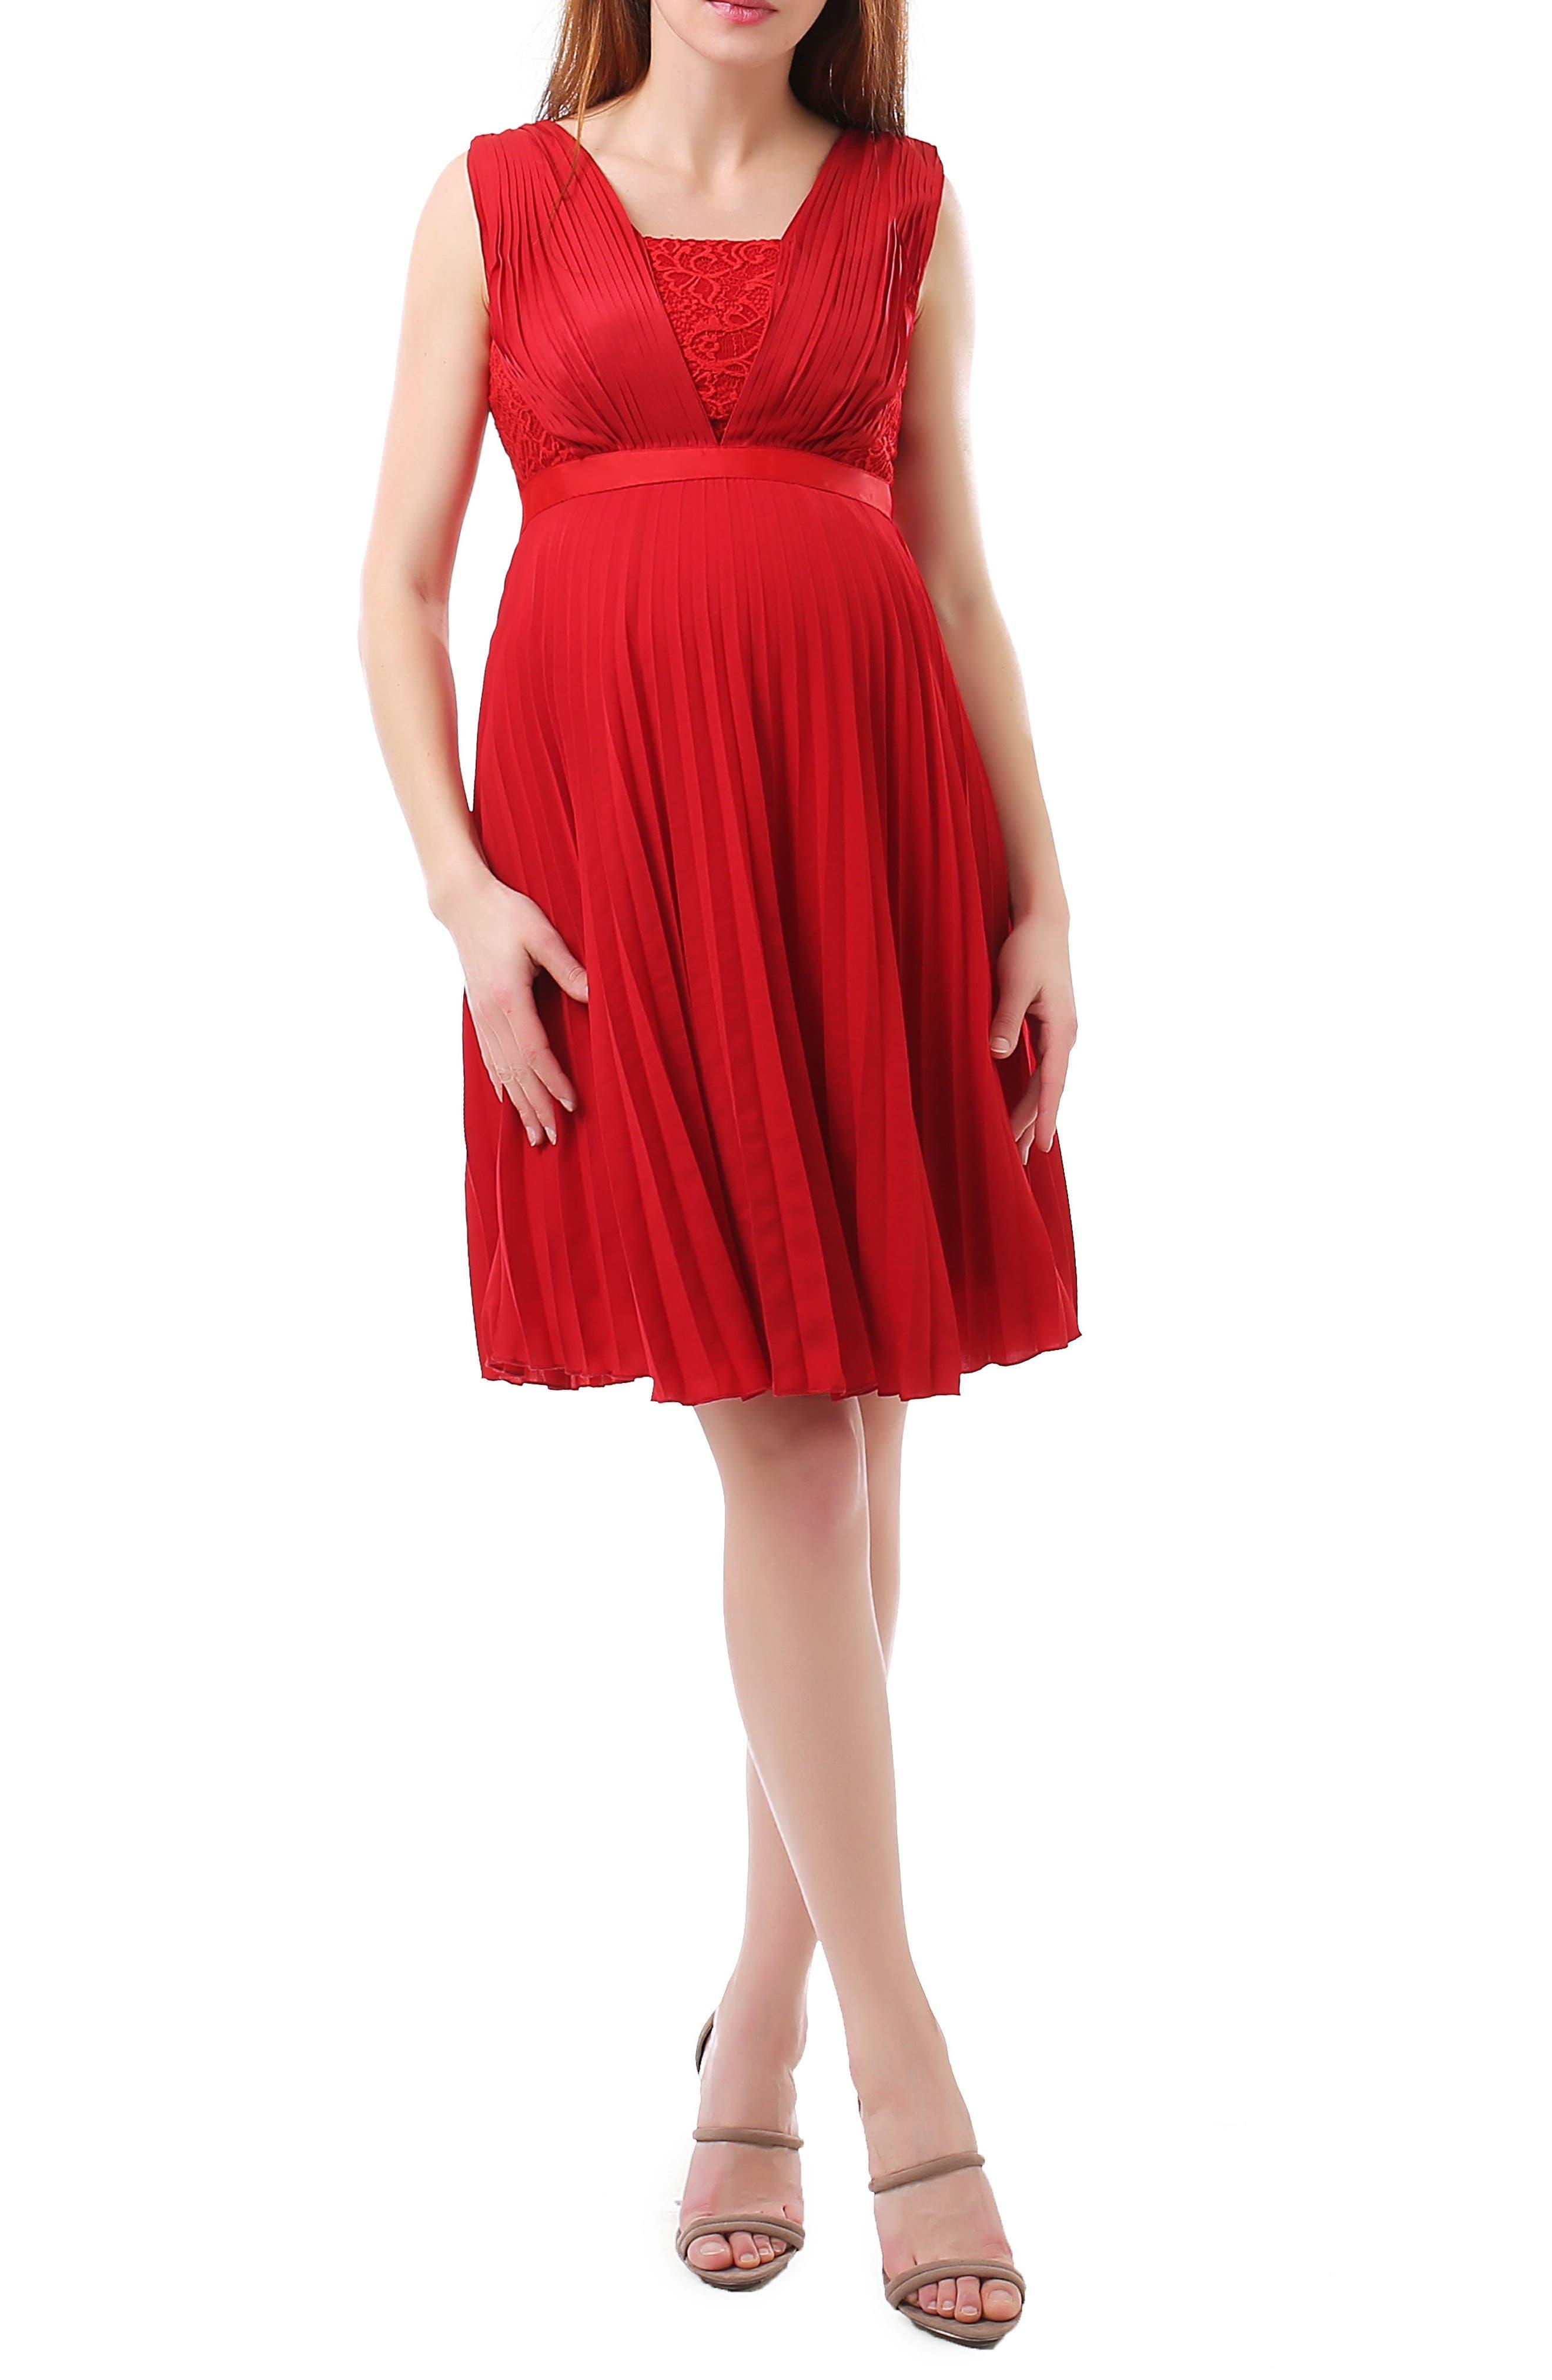 Lauren Chiffon & Lace Maternity Dress,                         Main,                         color, Red